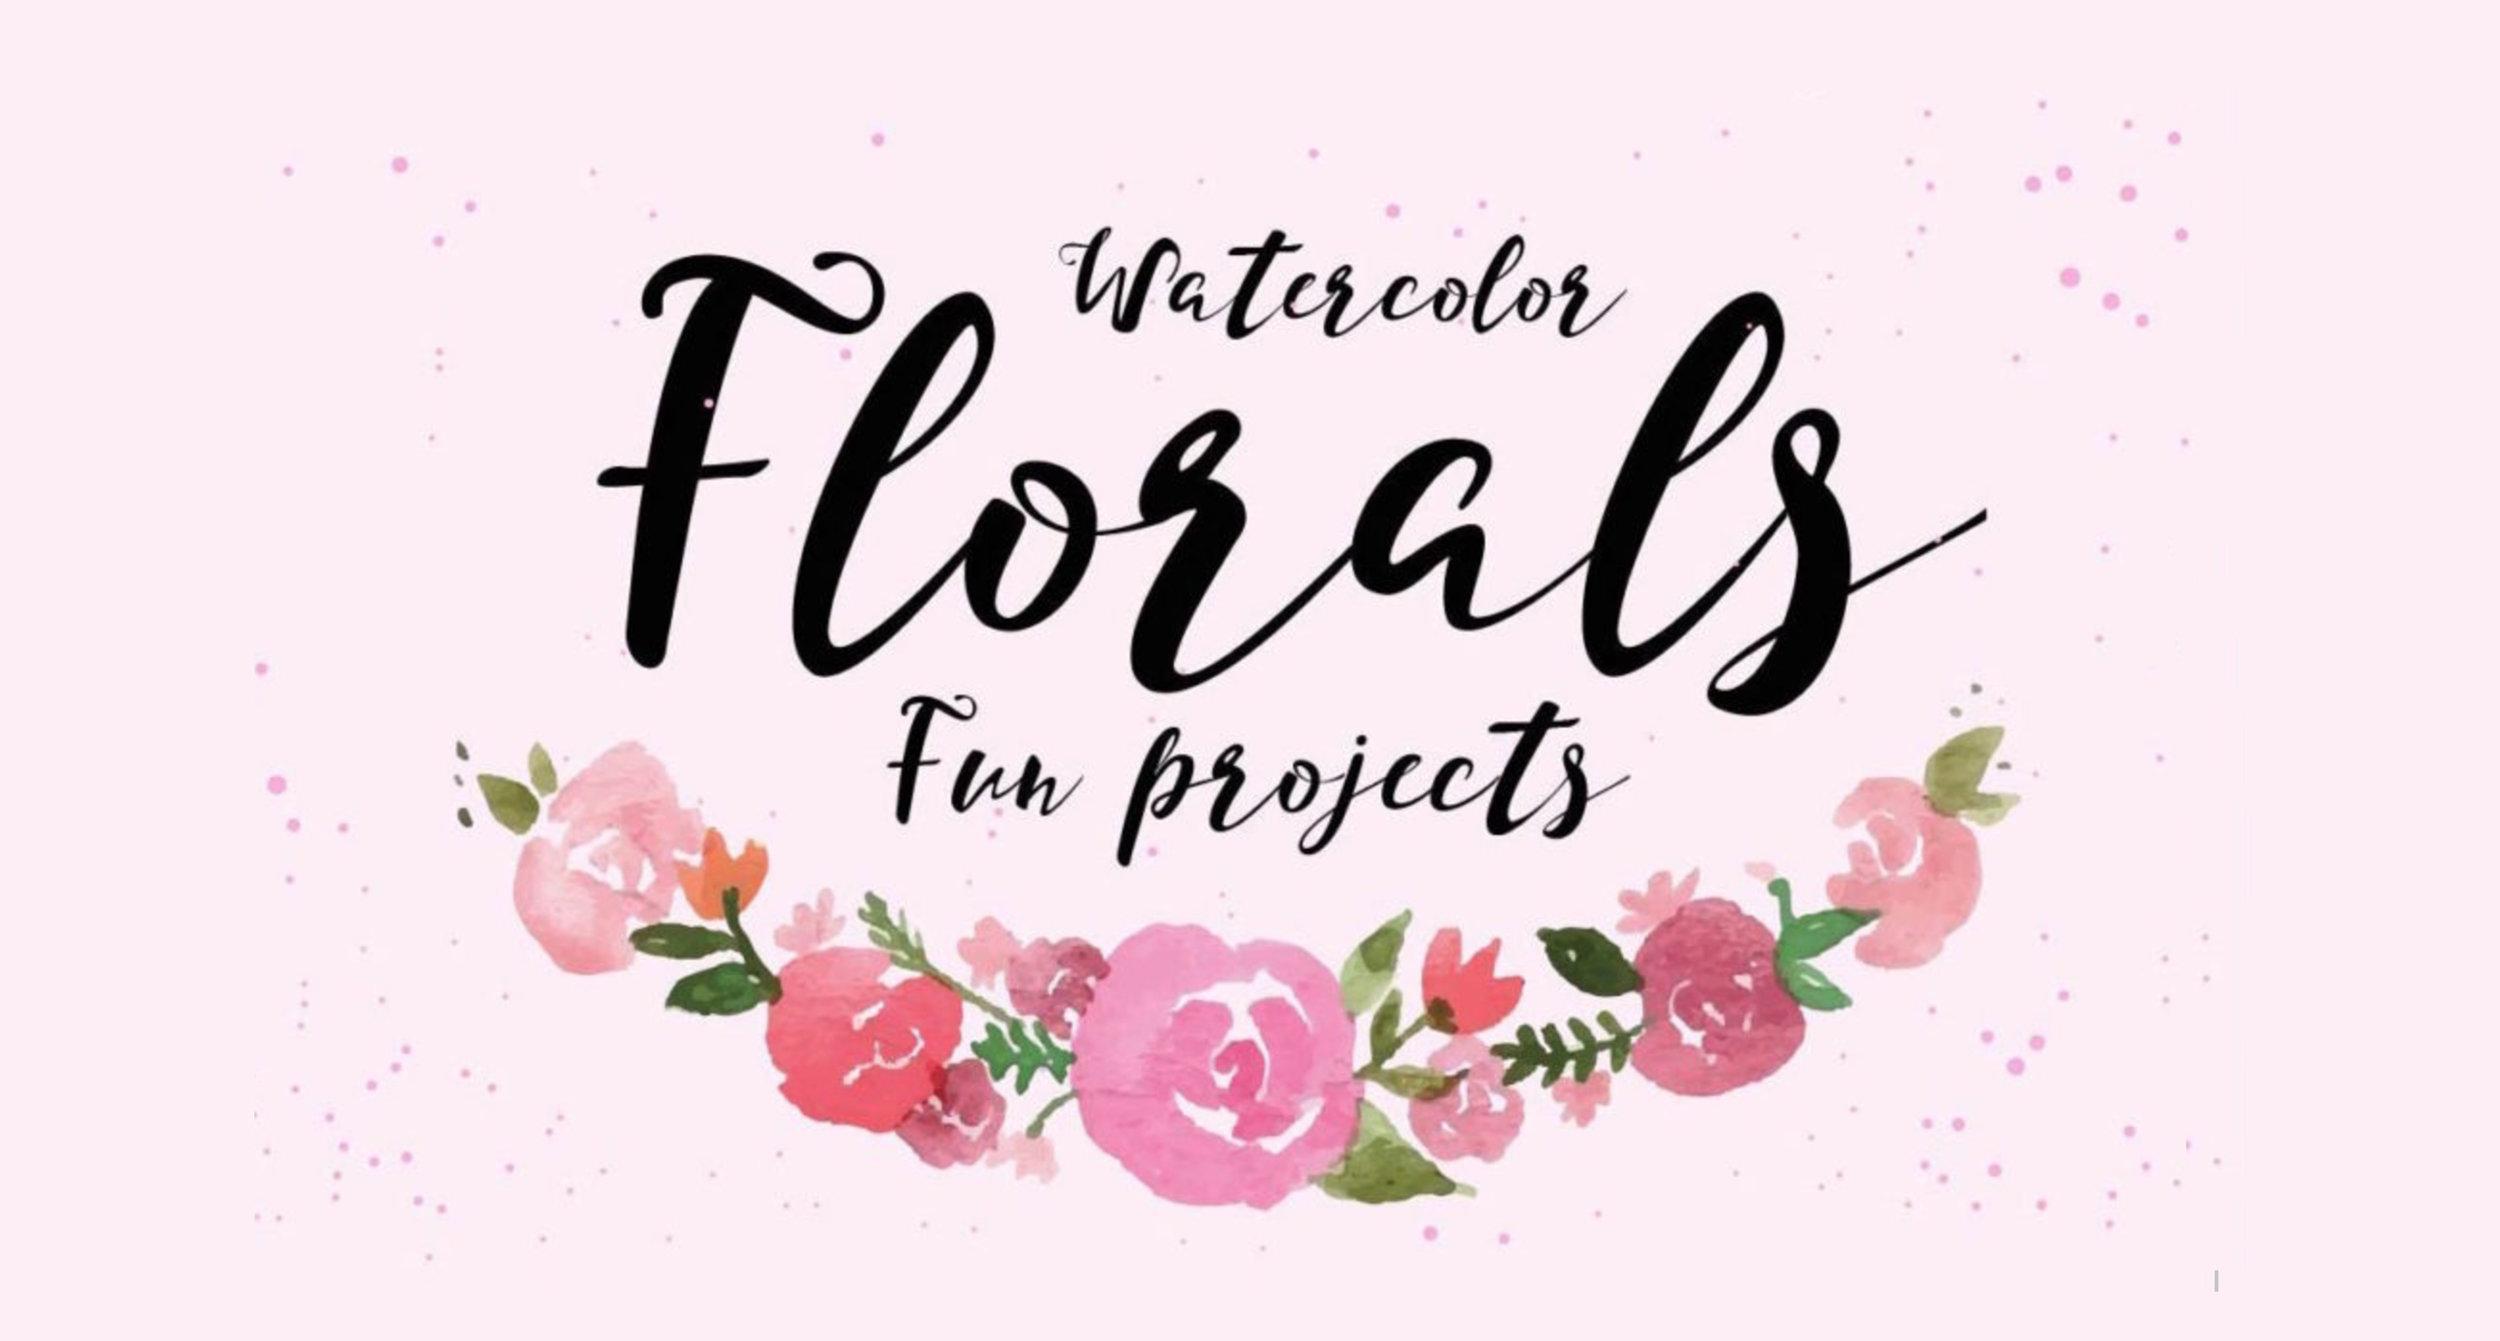 watercolorflorals.jpg